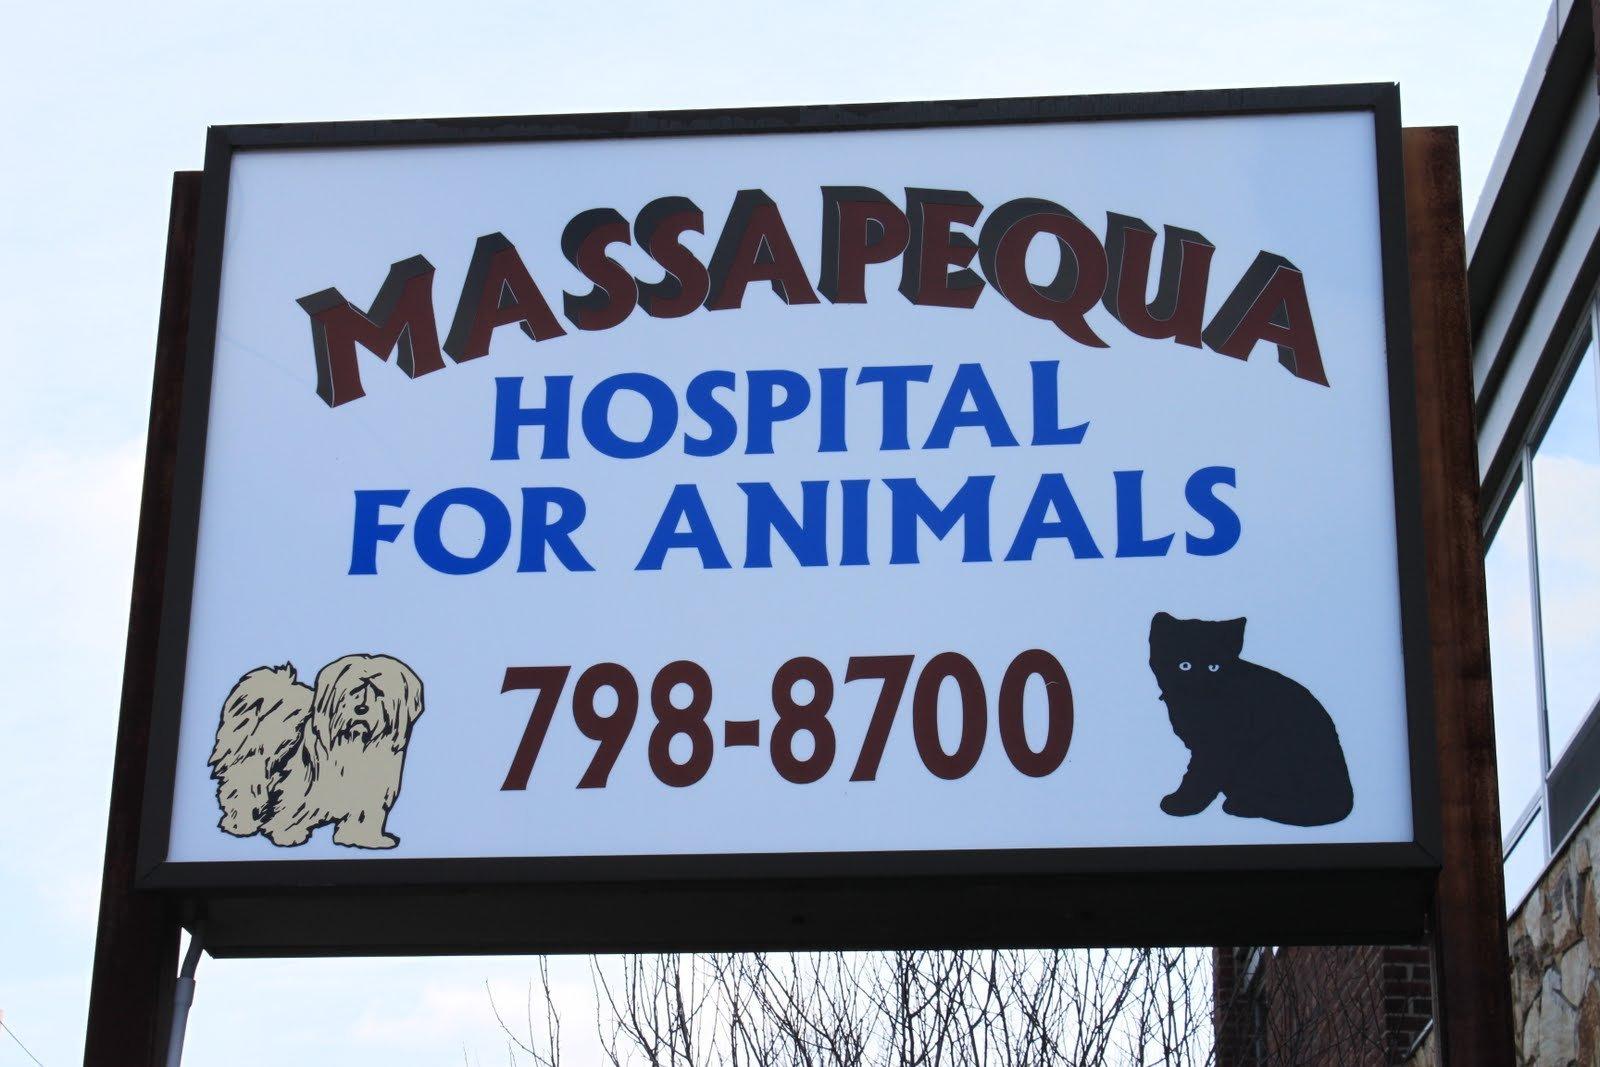 Massapequa Hospital For Animals Board